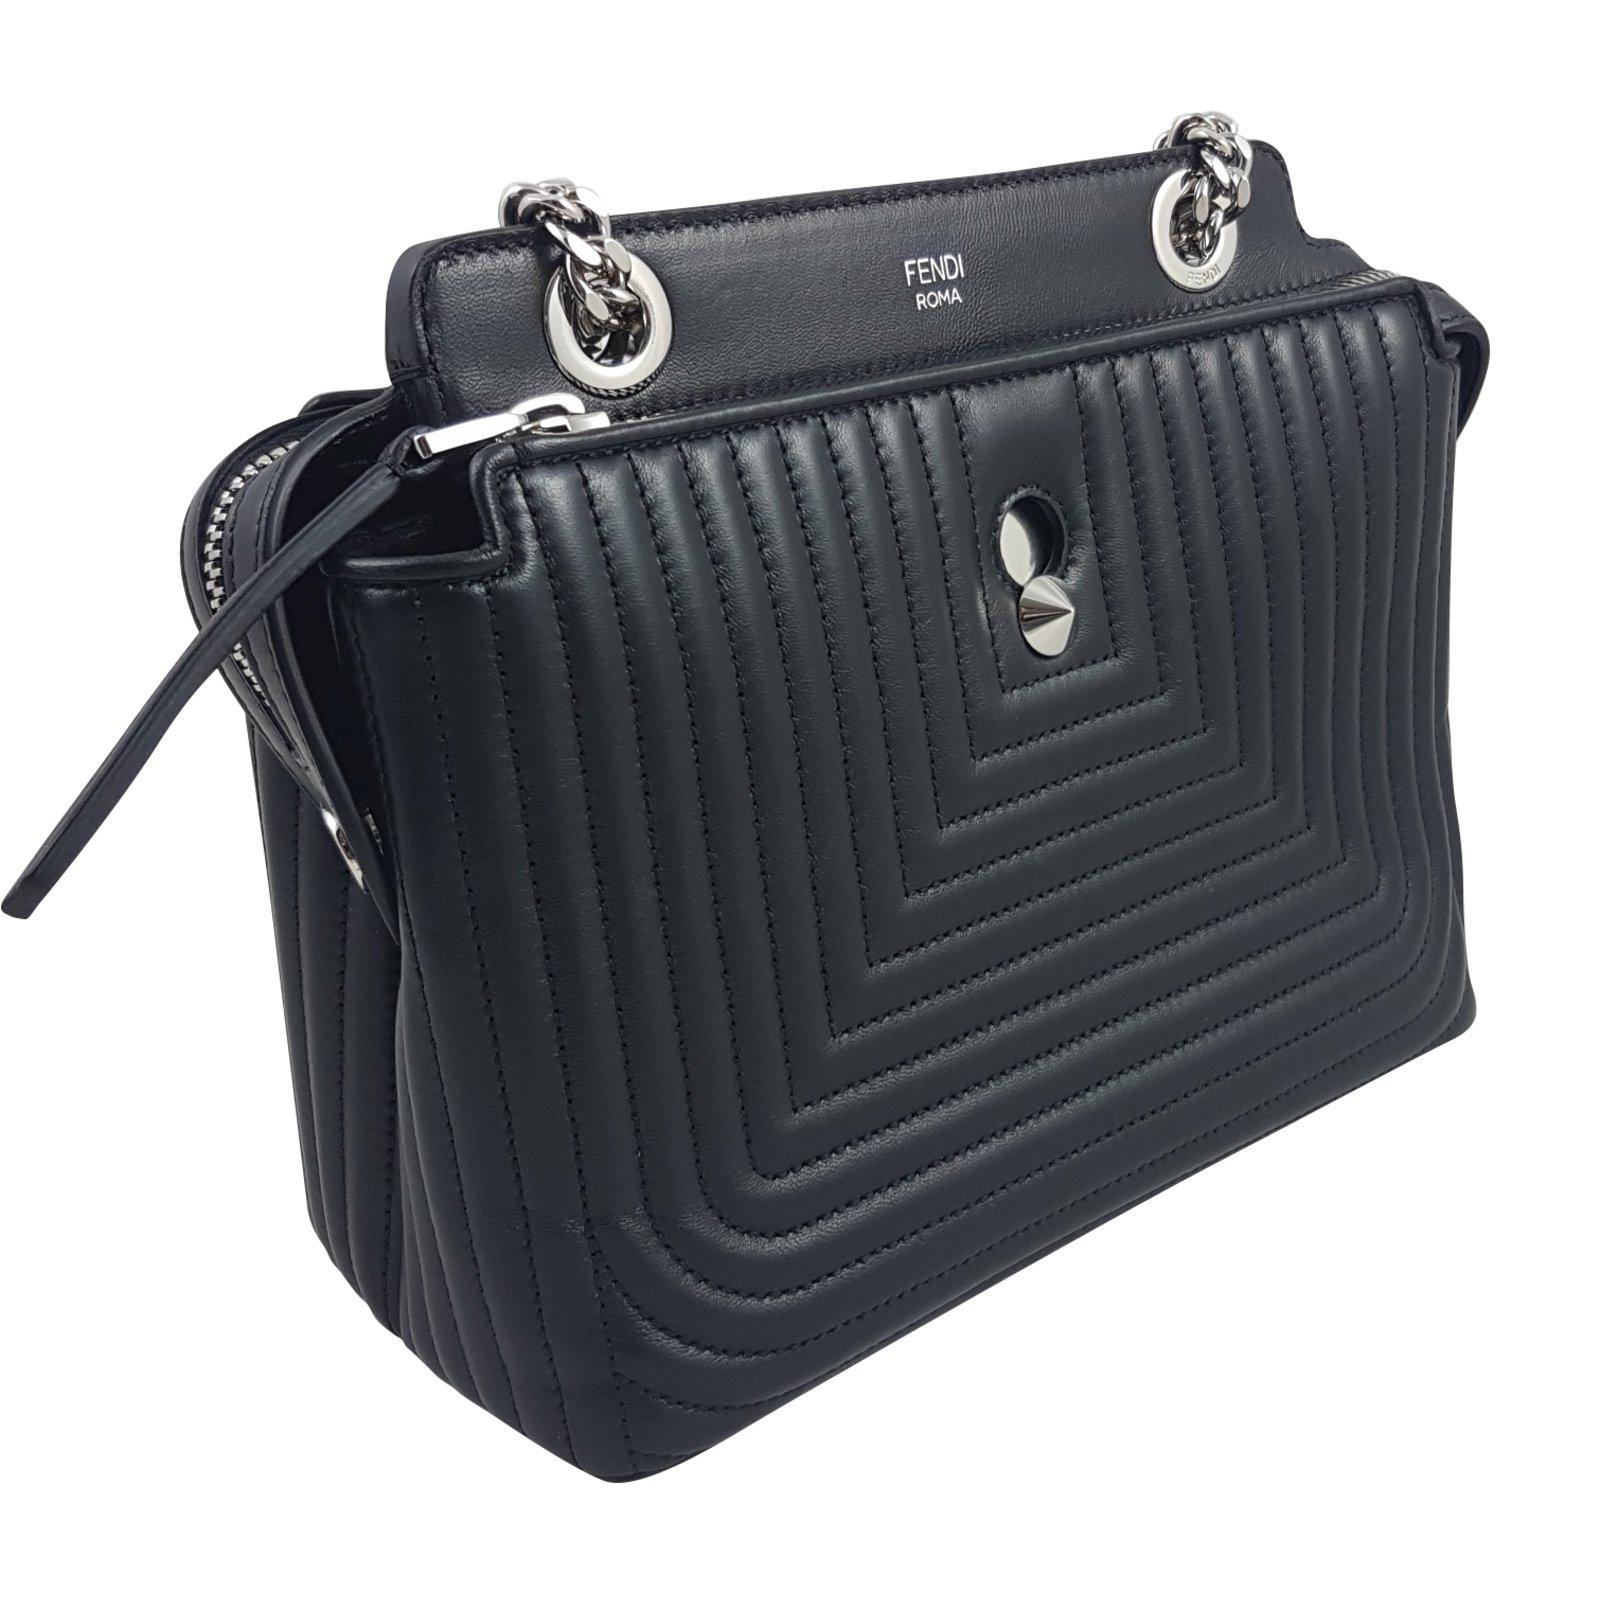 5ded40d572fe ... real fendi black dotcom quilted leather small shoulder bag handbags  leather black ref.59430 b6f88